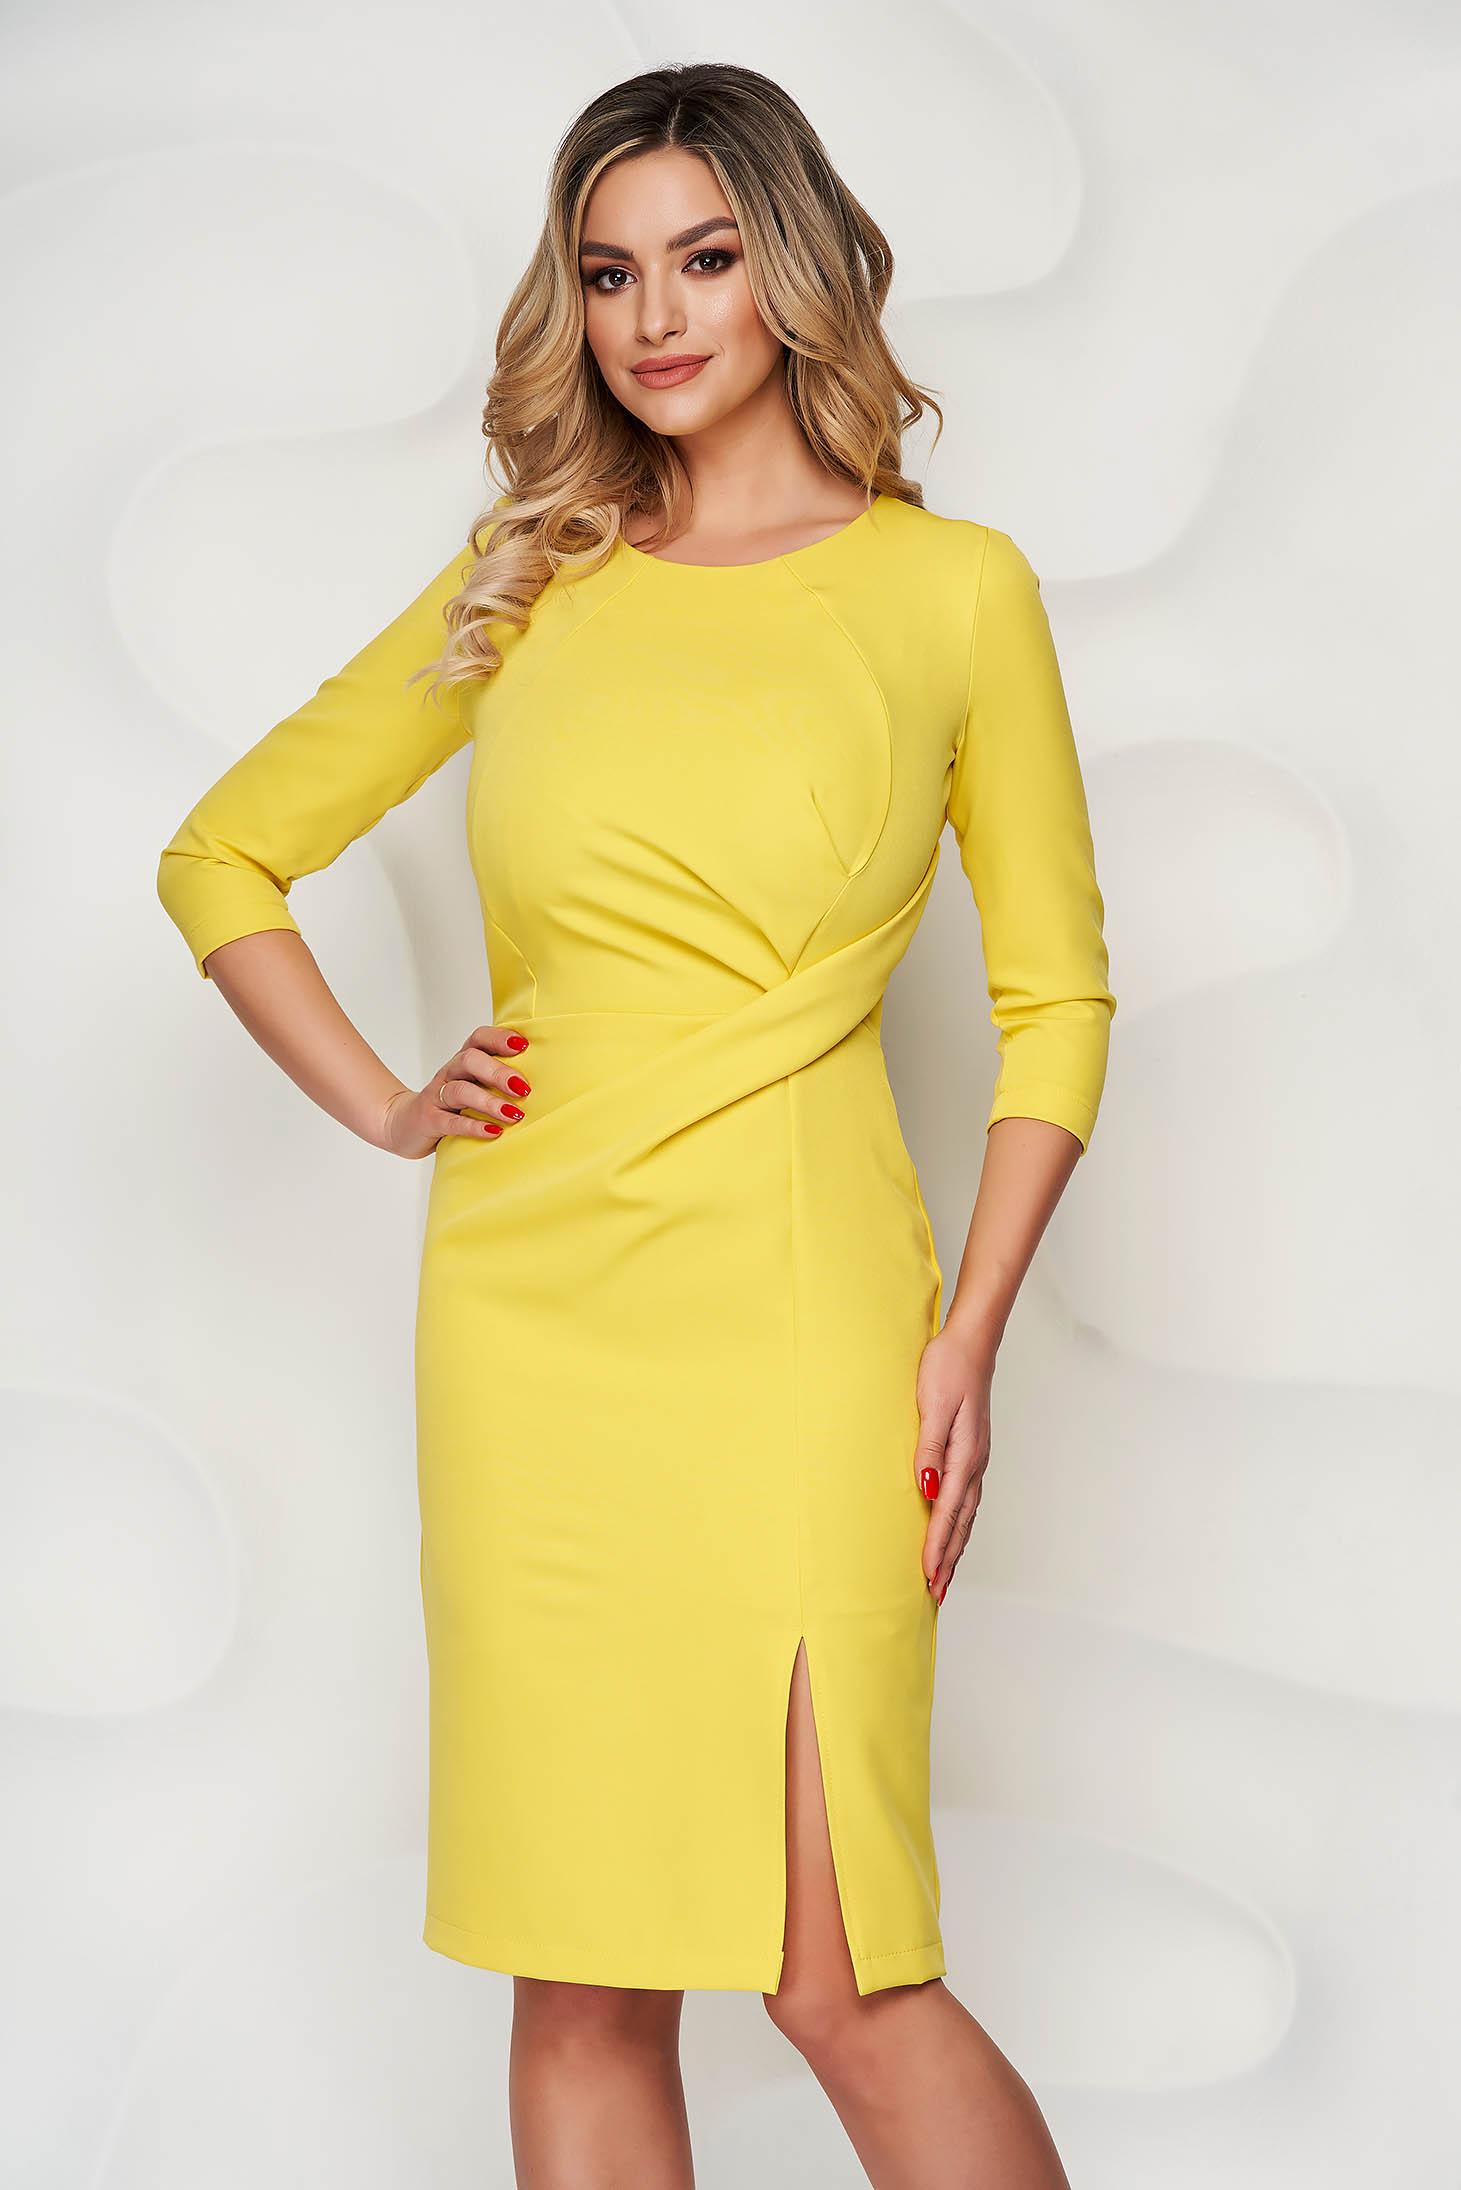 StarShinerS yellow dress office midi pencil slightly elastic fabric slit